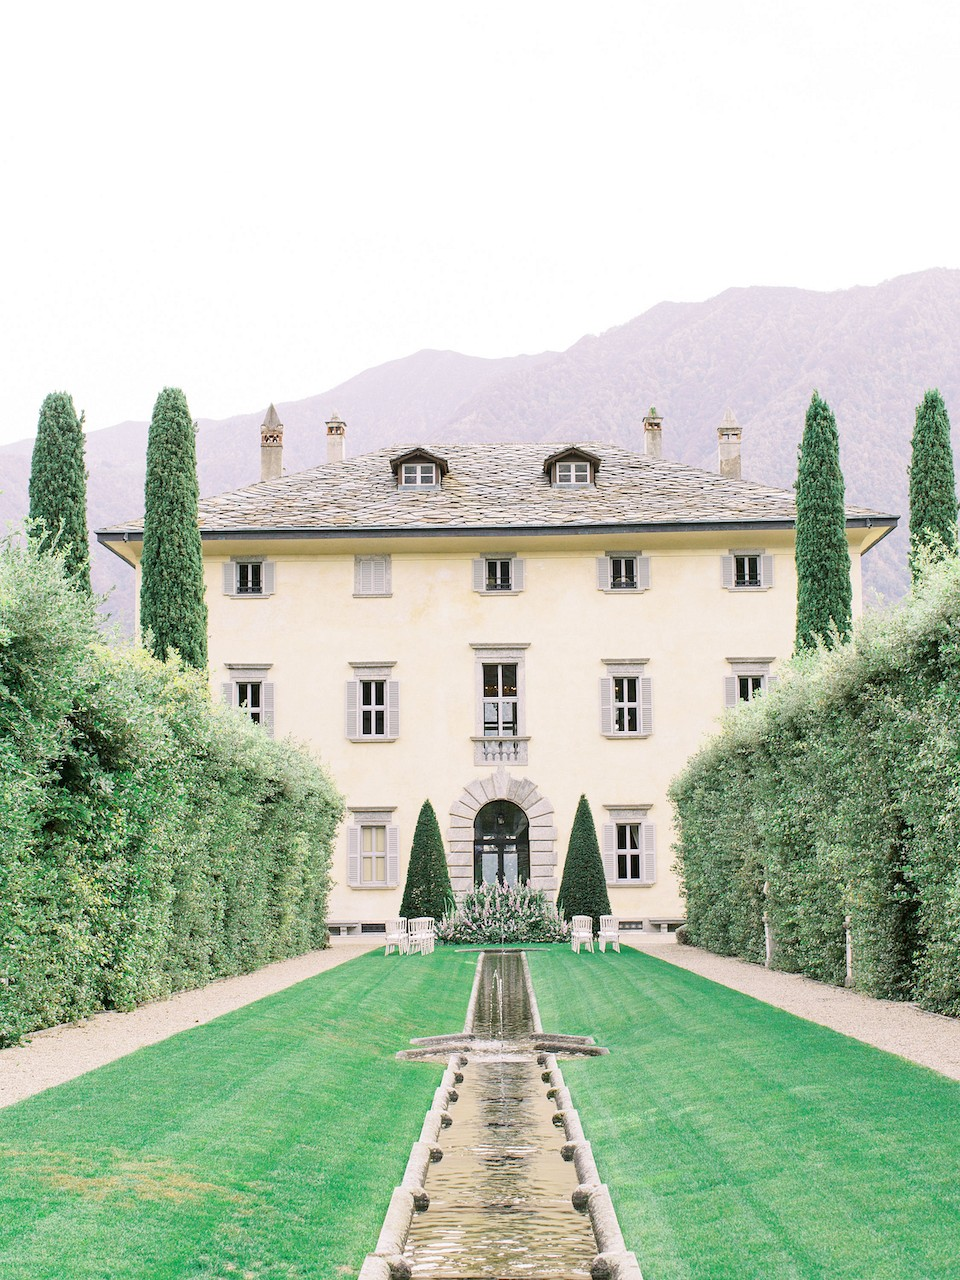 Villa Balbiano wedding venue